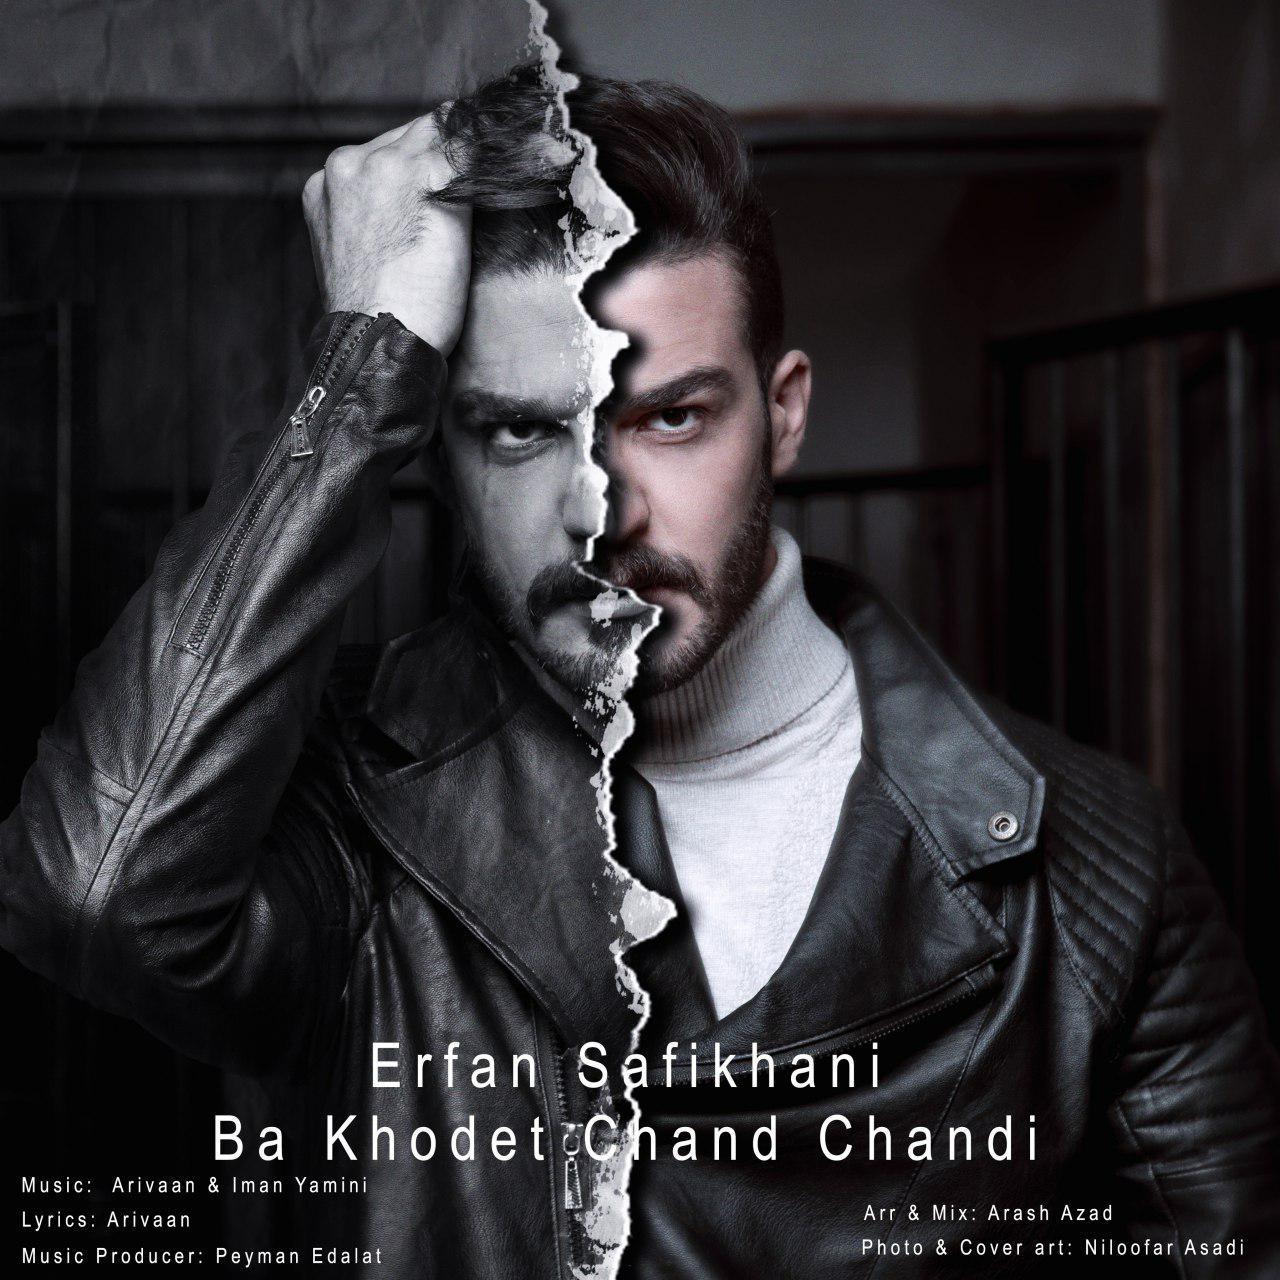 Erfan Safikhani – Ba Khodet Chand Chandi